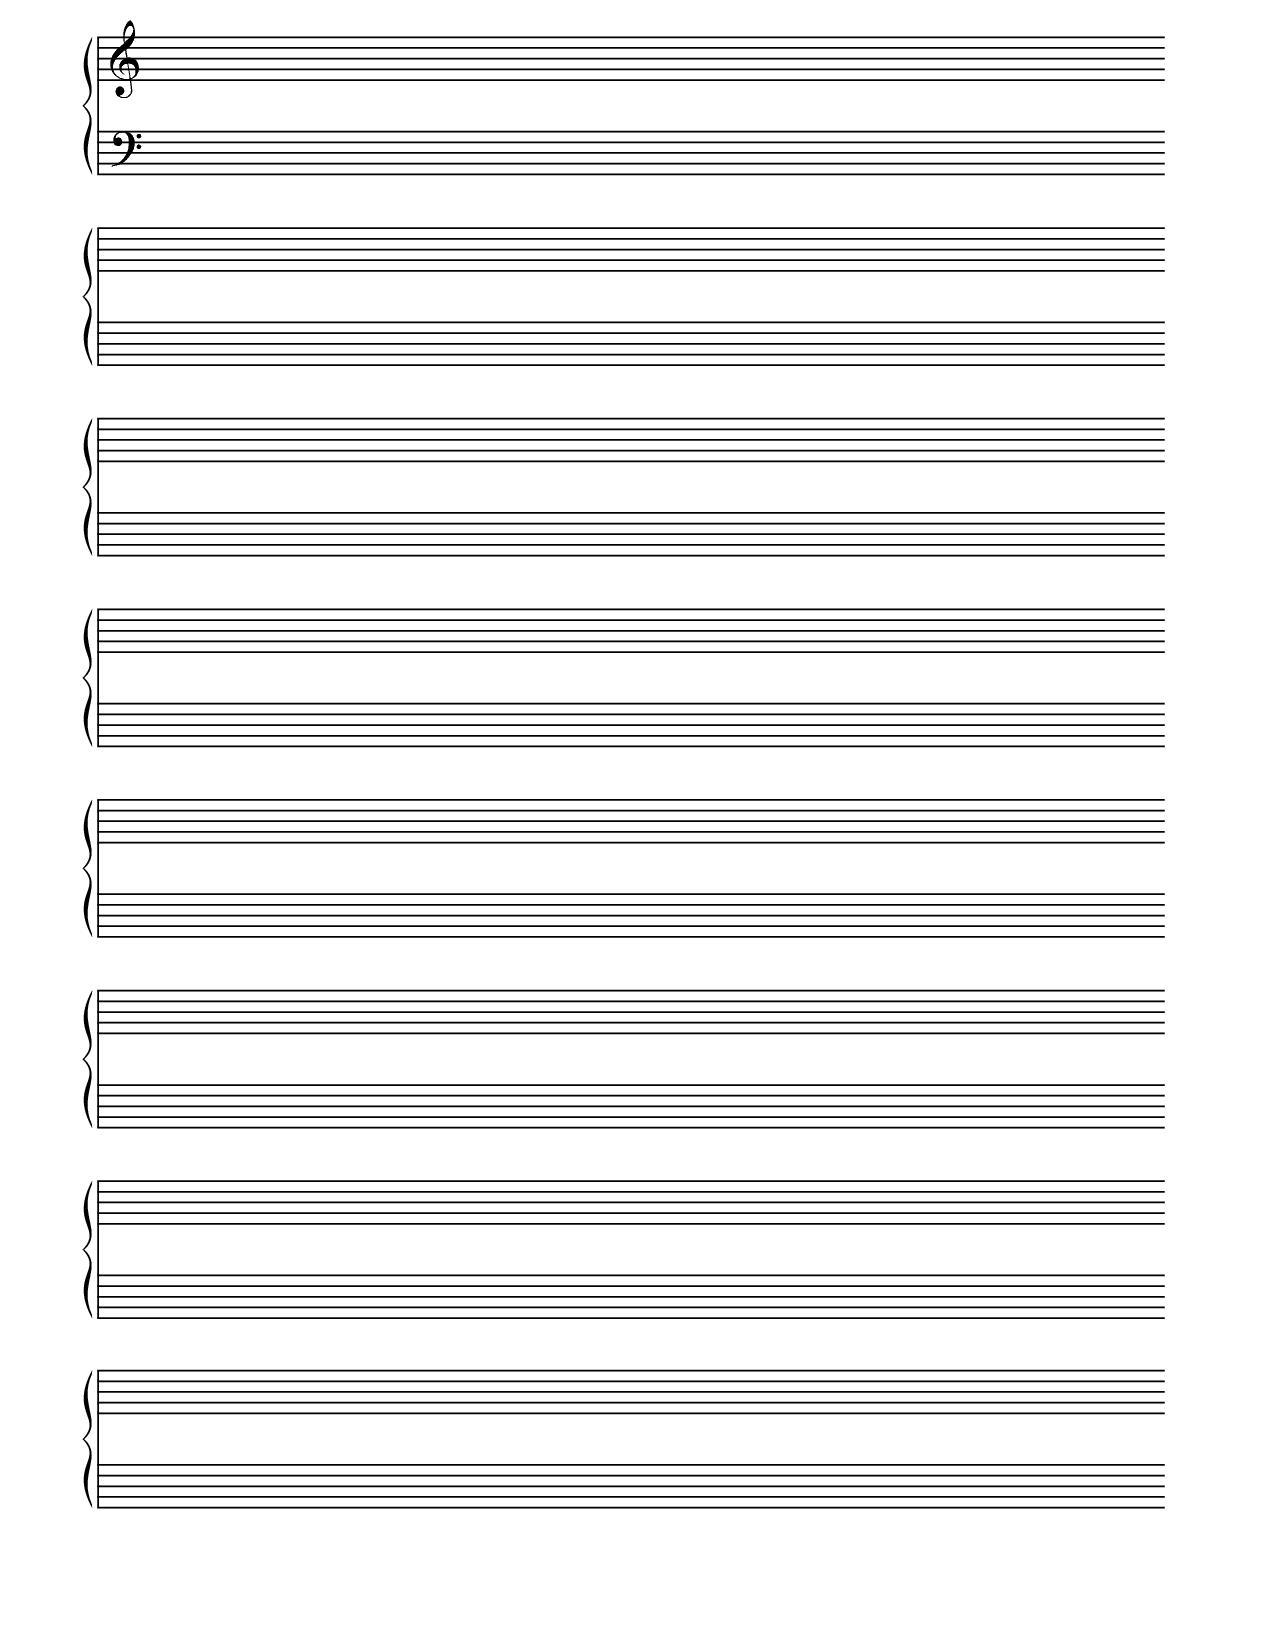 Printable Blank Piano Sheet Music Paper | Print In 2019 | Pinterest - Free Printable Blank Music Staff Paper